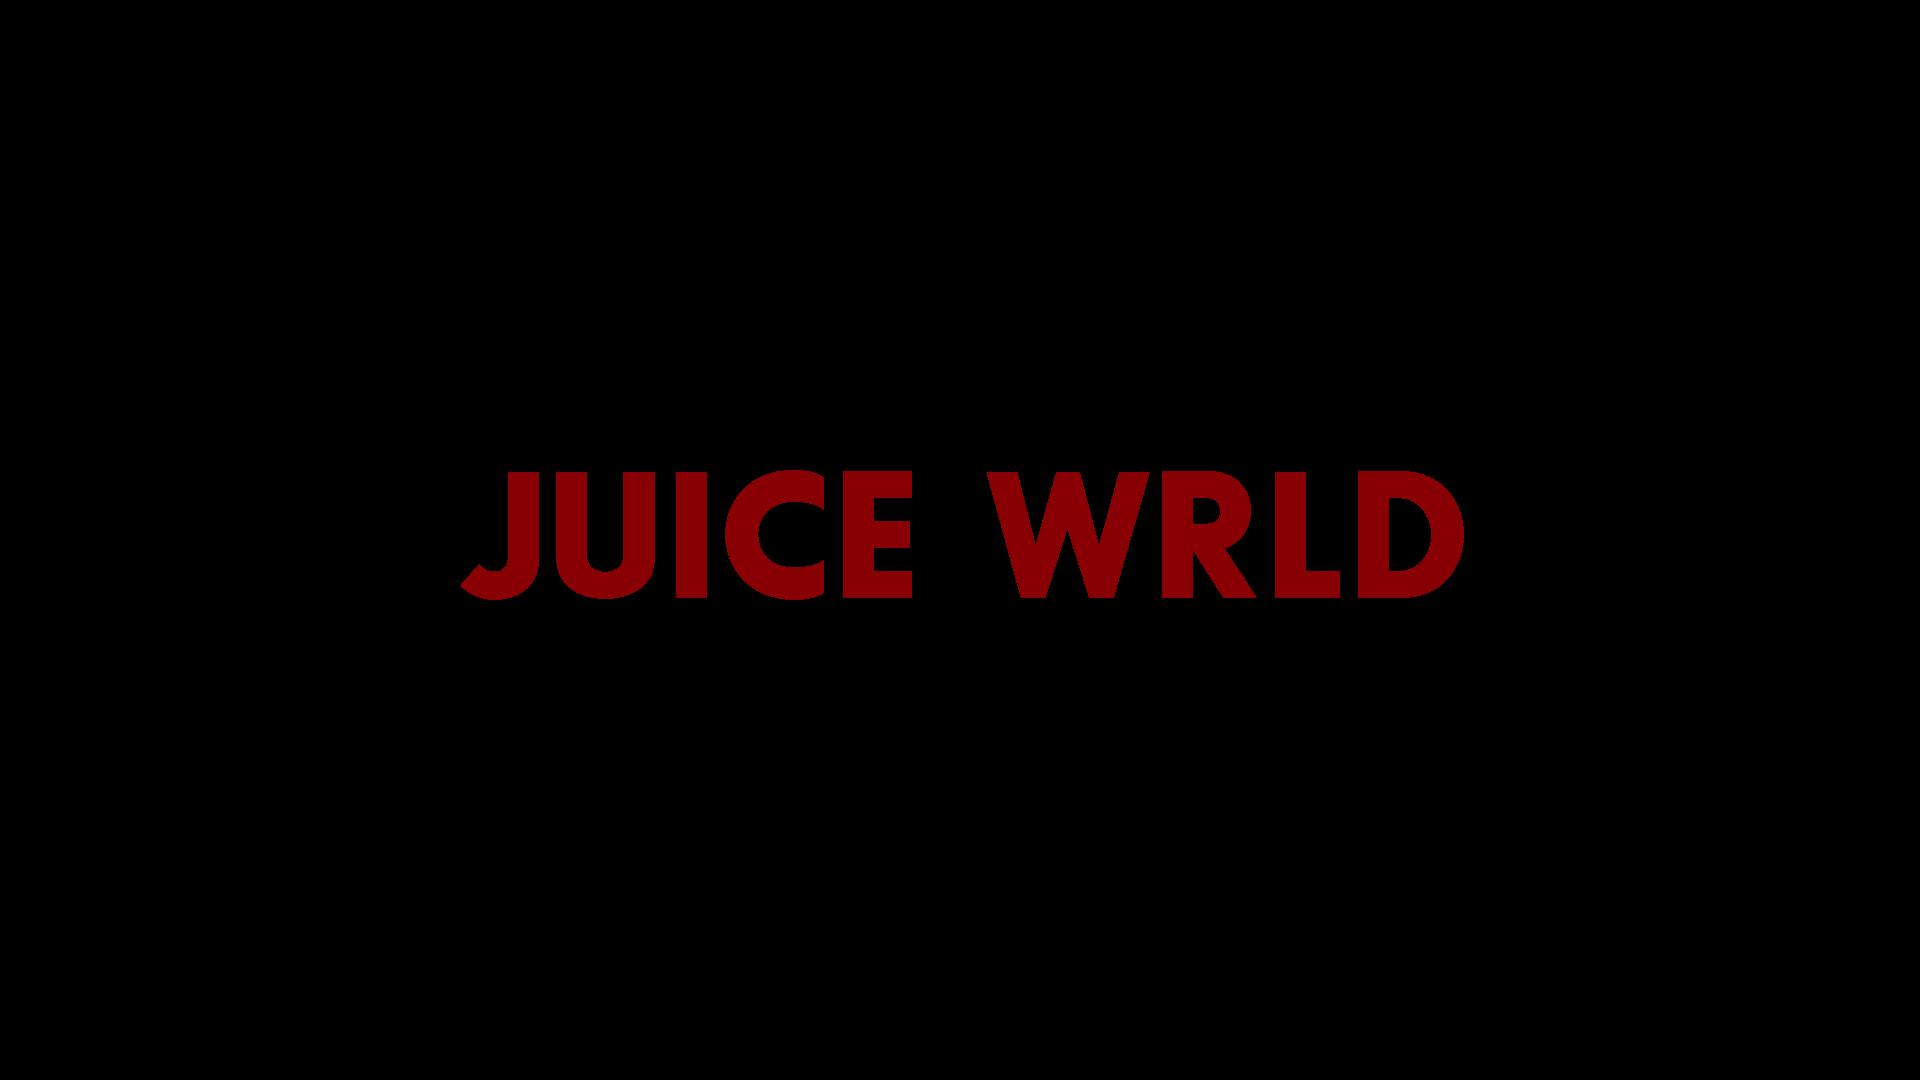 50 Juice Wrld Wallpapers Download At Wallpaperbro Juicewrldwallpaperiphone 50 Juice Wrld In 2020 Juice Logos Computer Wallpaper Desktop Wallpapers